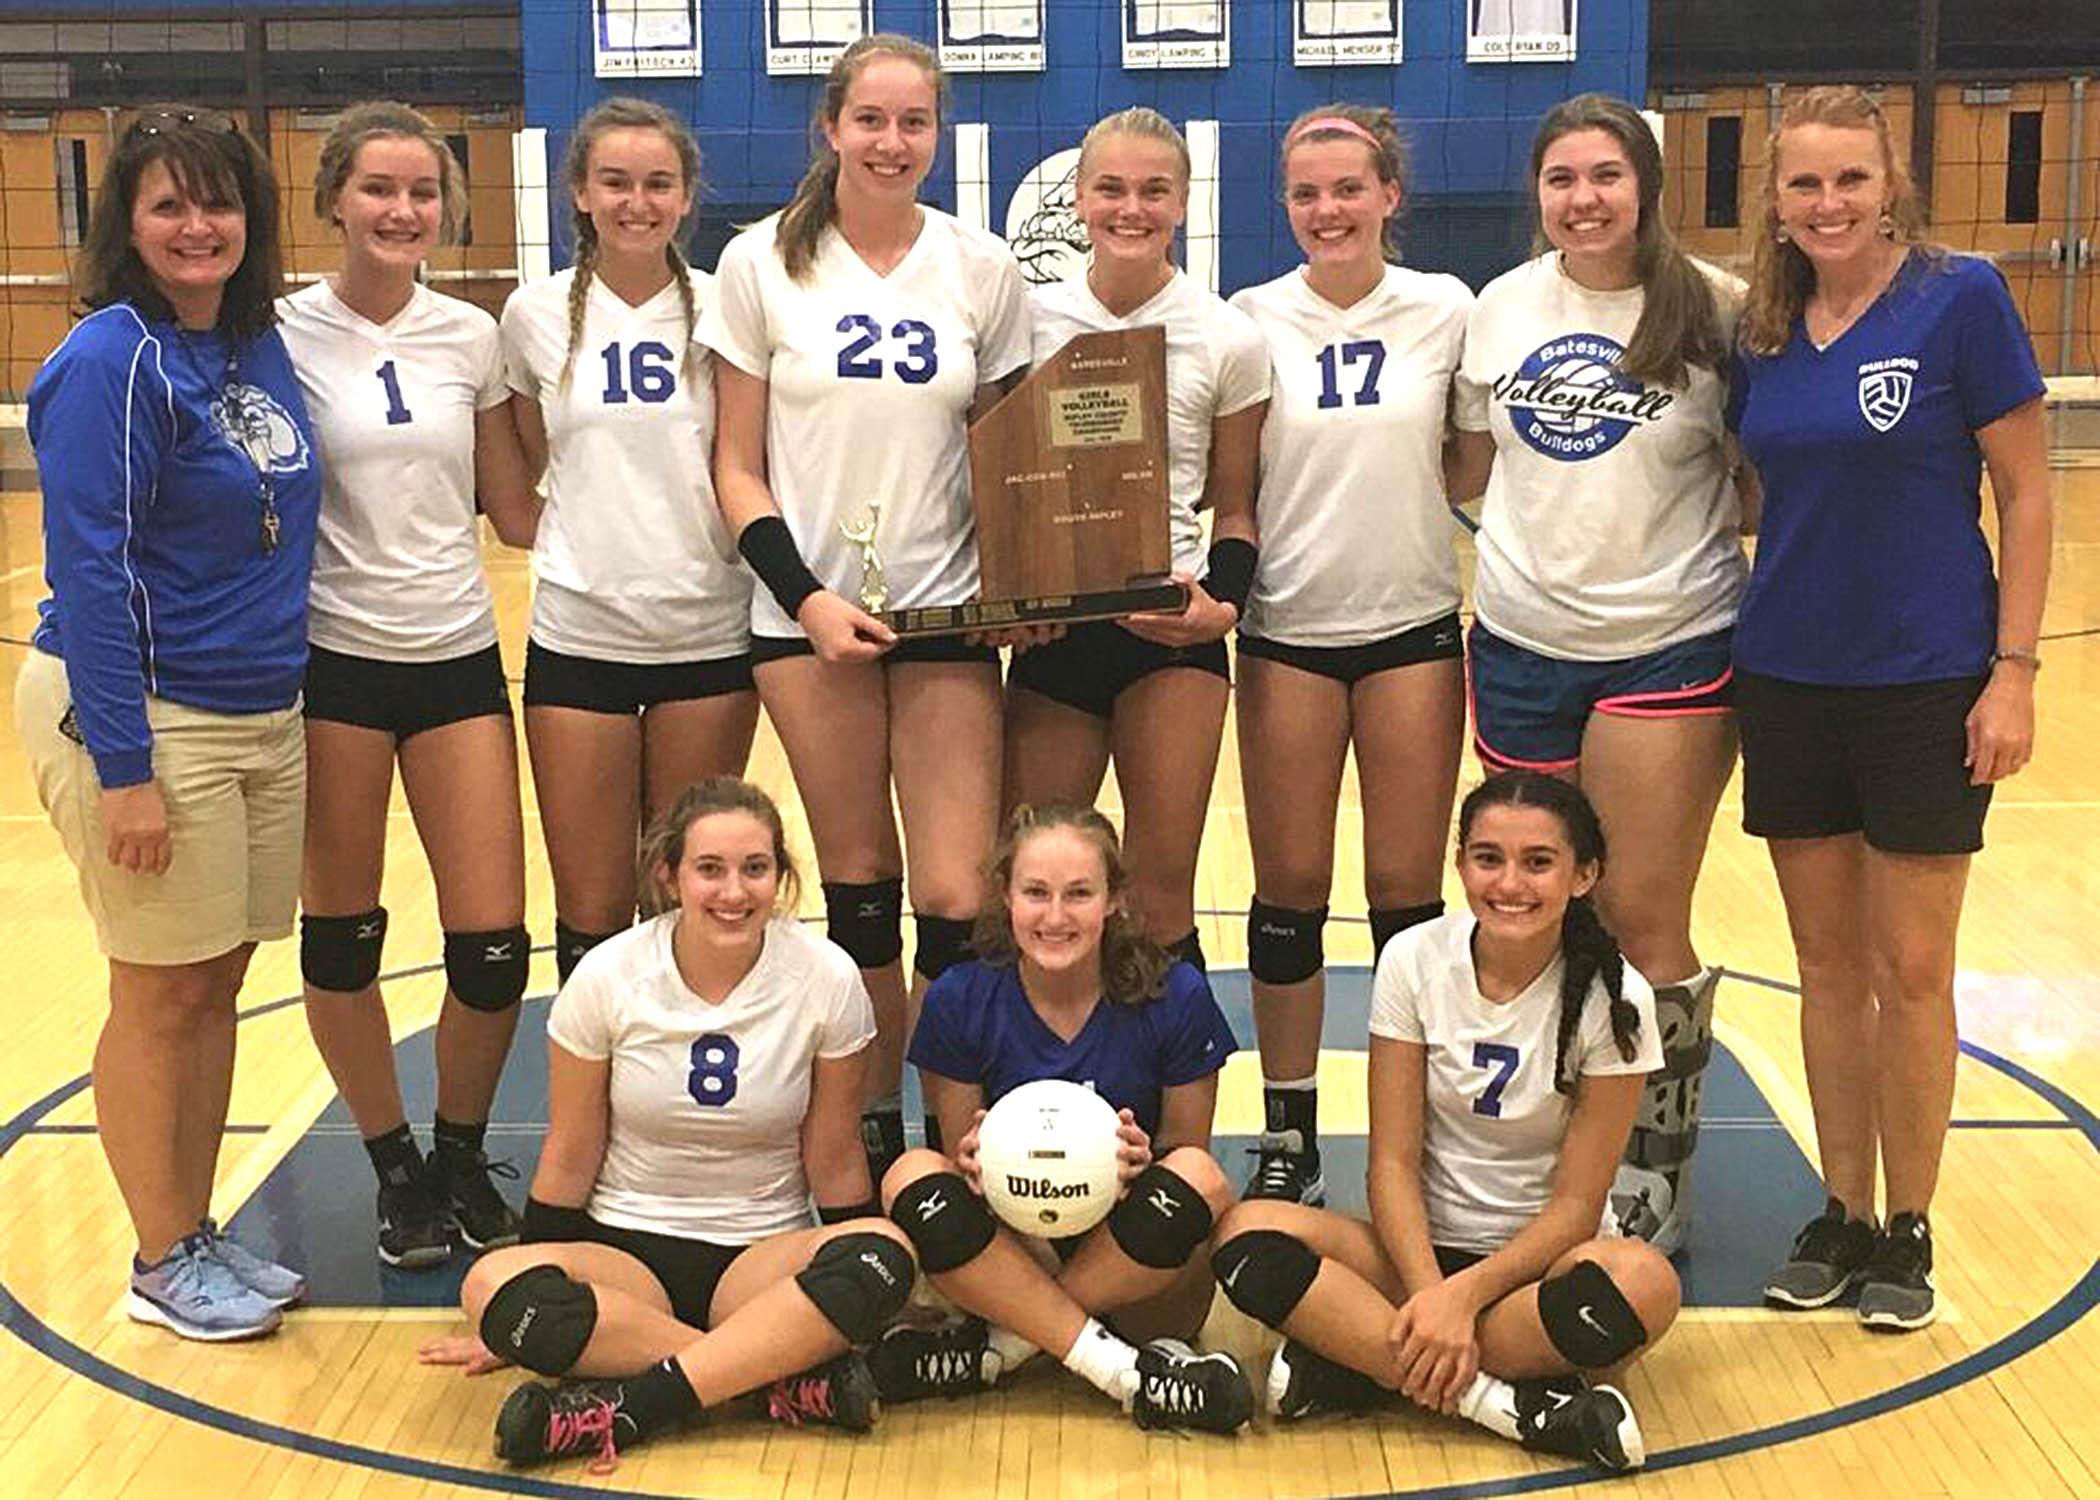 Lady Bulldogs win Ripley County title